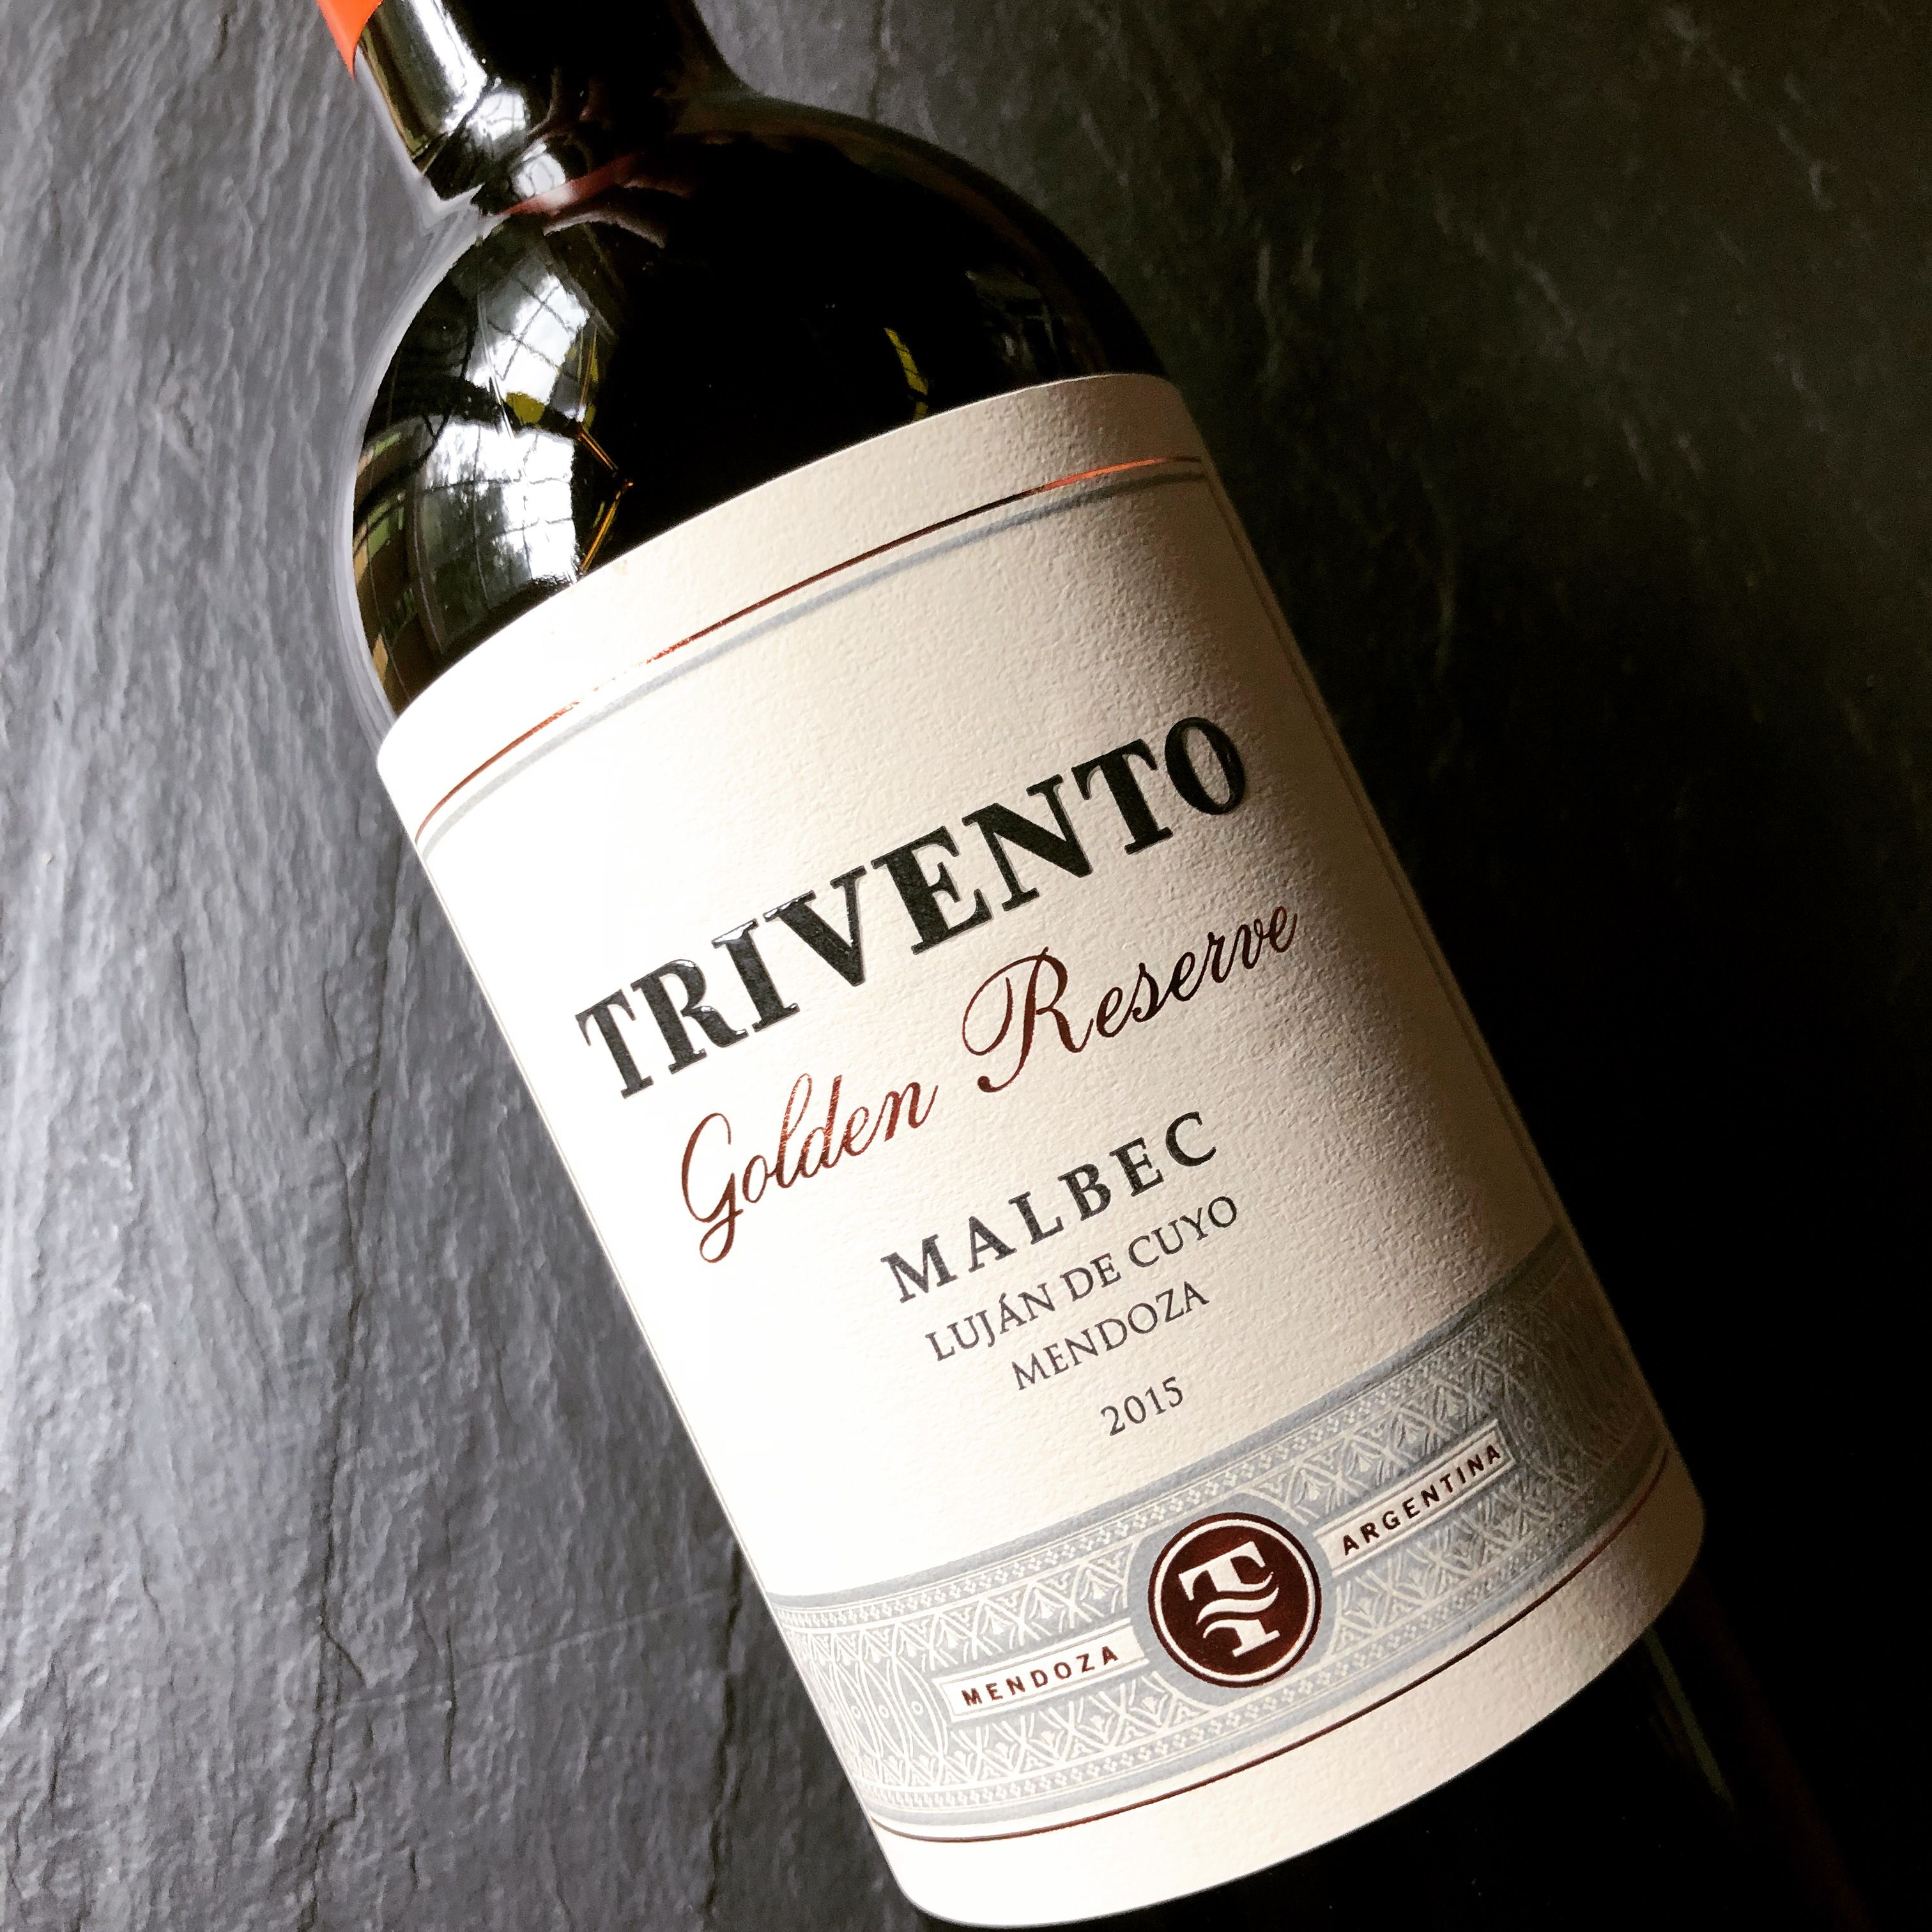 Trivento Golden Reserve Malbec 2015 In 2020 Wine Pairing Malbec Wine